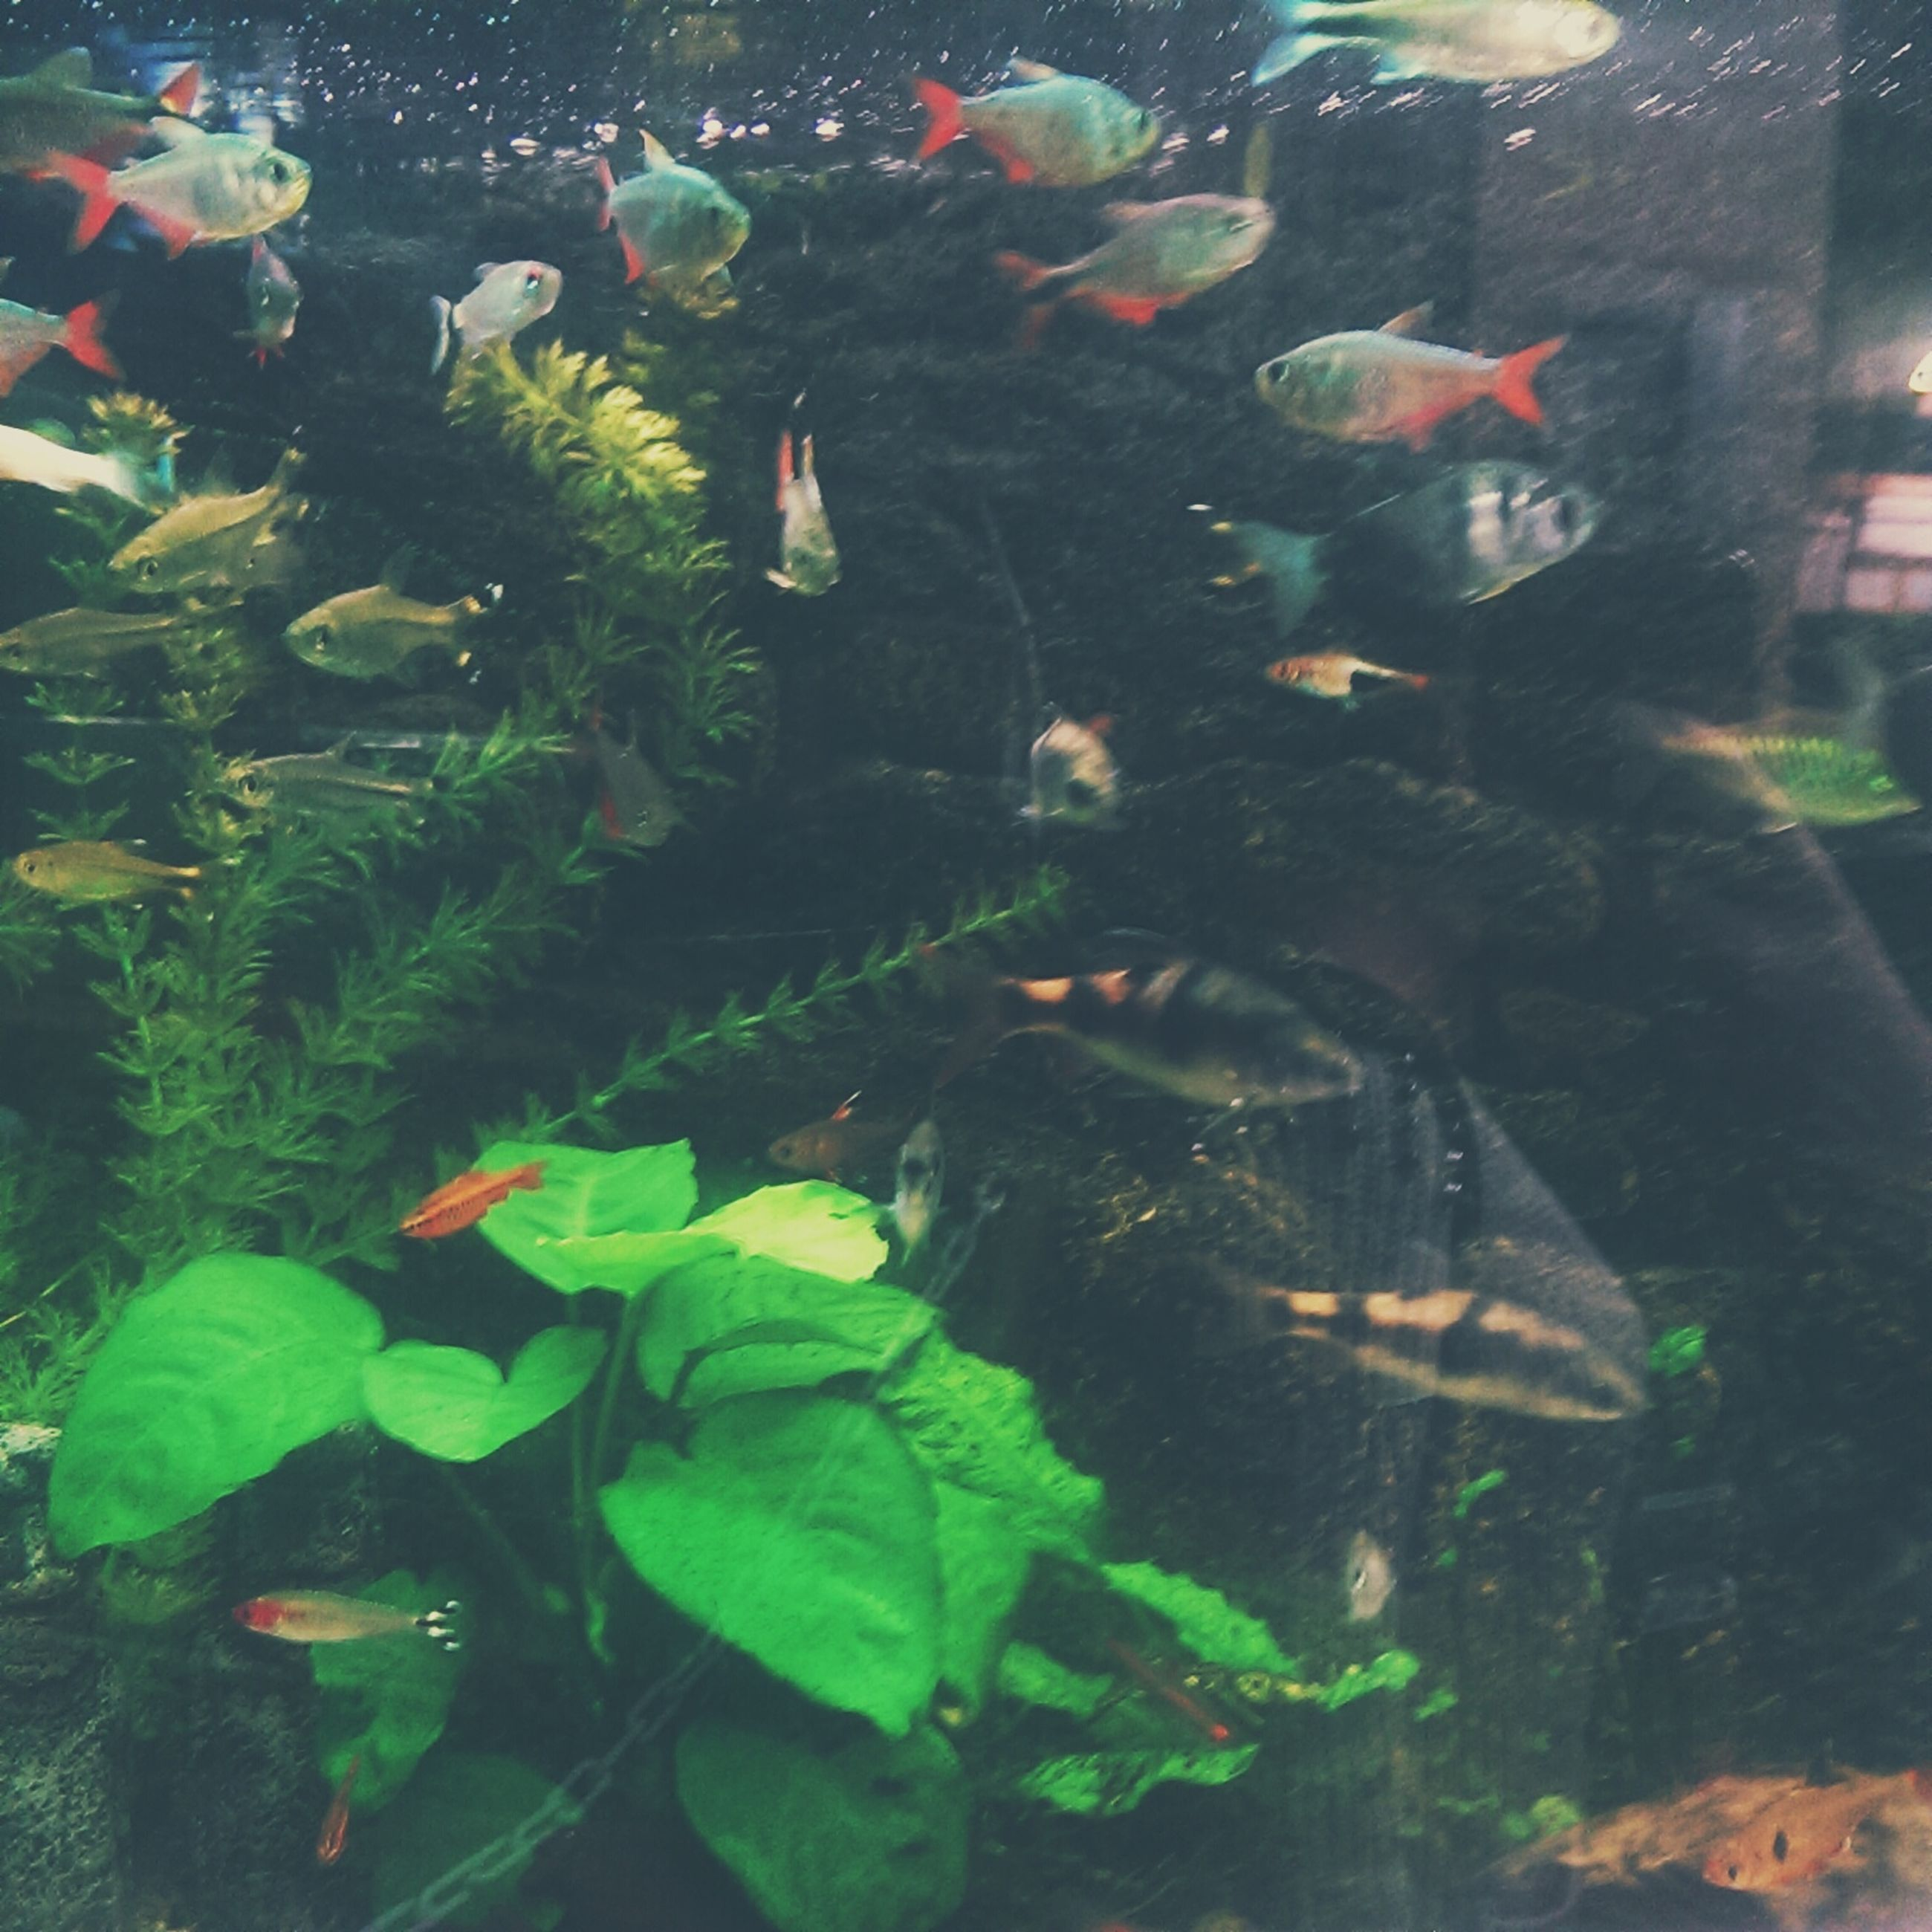 animal themes, animals in the wild, wildlife, swimming, water, fish, bird, underwater, pond, sea life, school of fish, medium group of animals, nature, high angle view, koi carp, lake, beauty in nature, aquarium